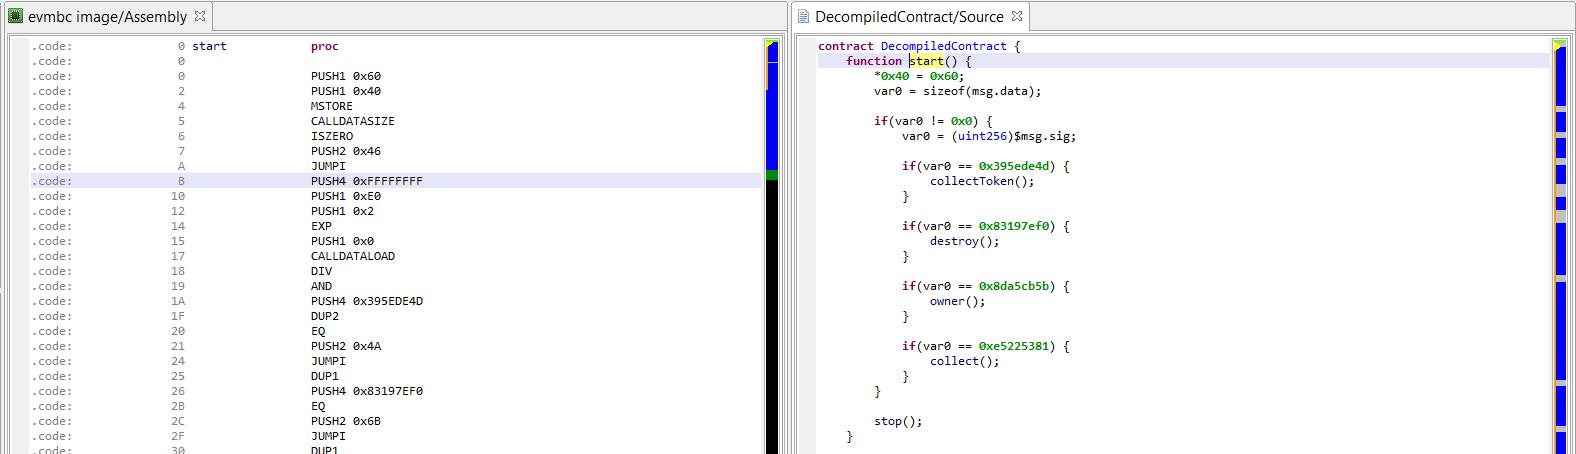 MOV AX, BX Code depilation salon: Articles, Code samples, Processor